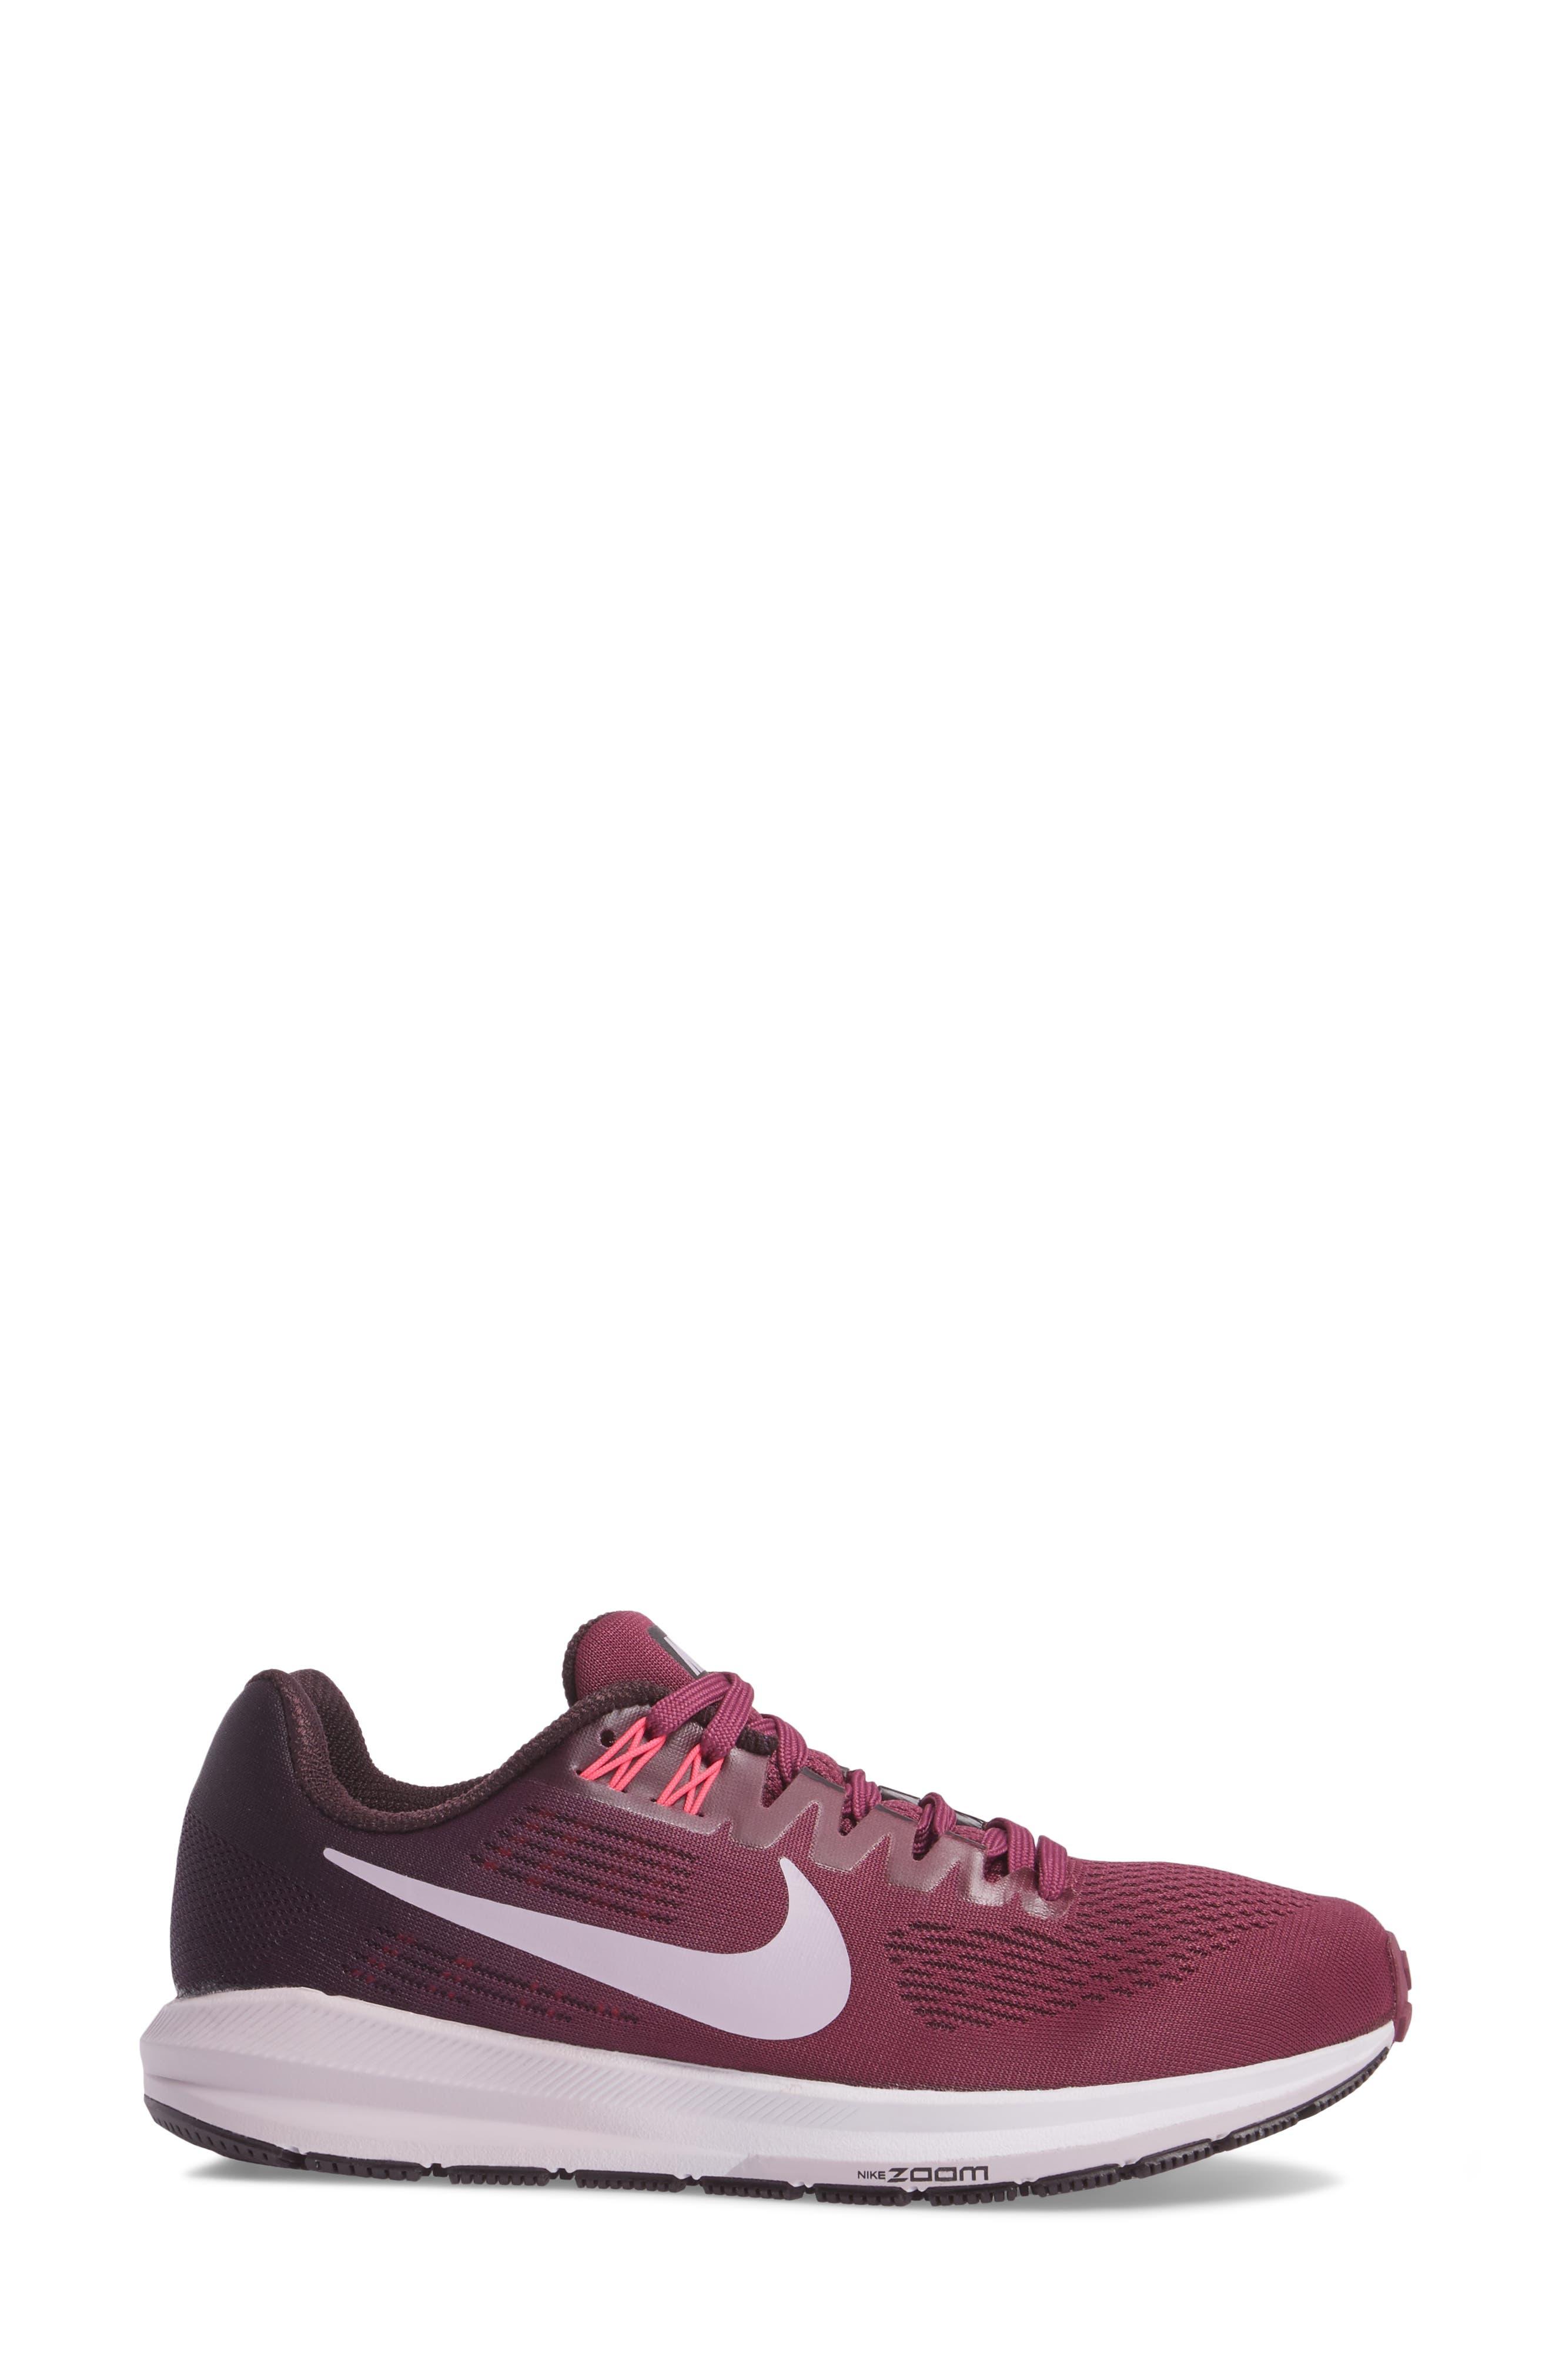 Alternate Image 3  - Nike Air Zoom Structure 21 Running Shoe (Women)